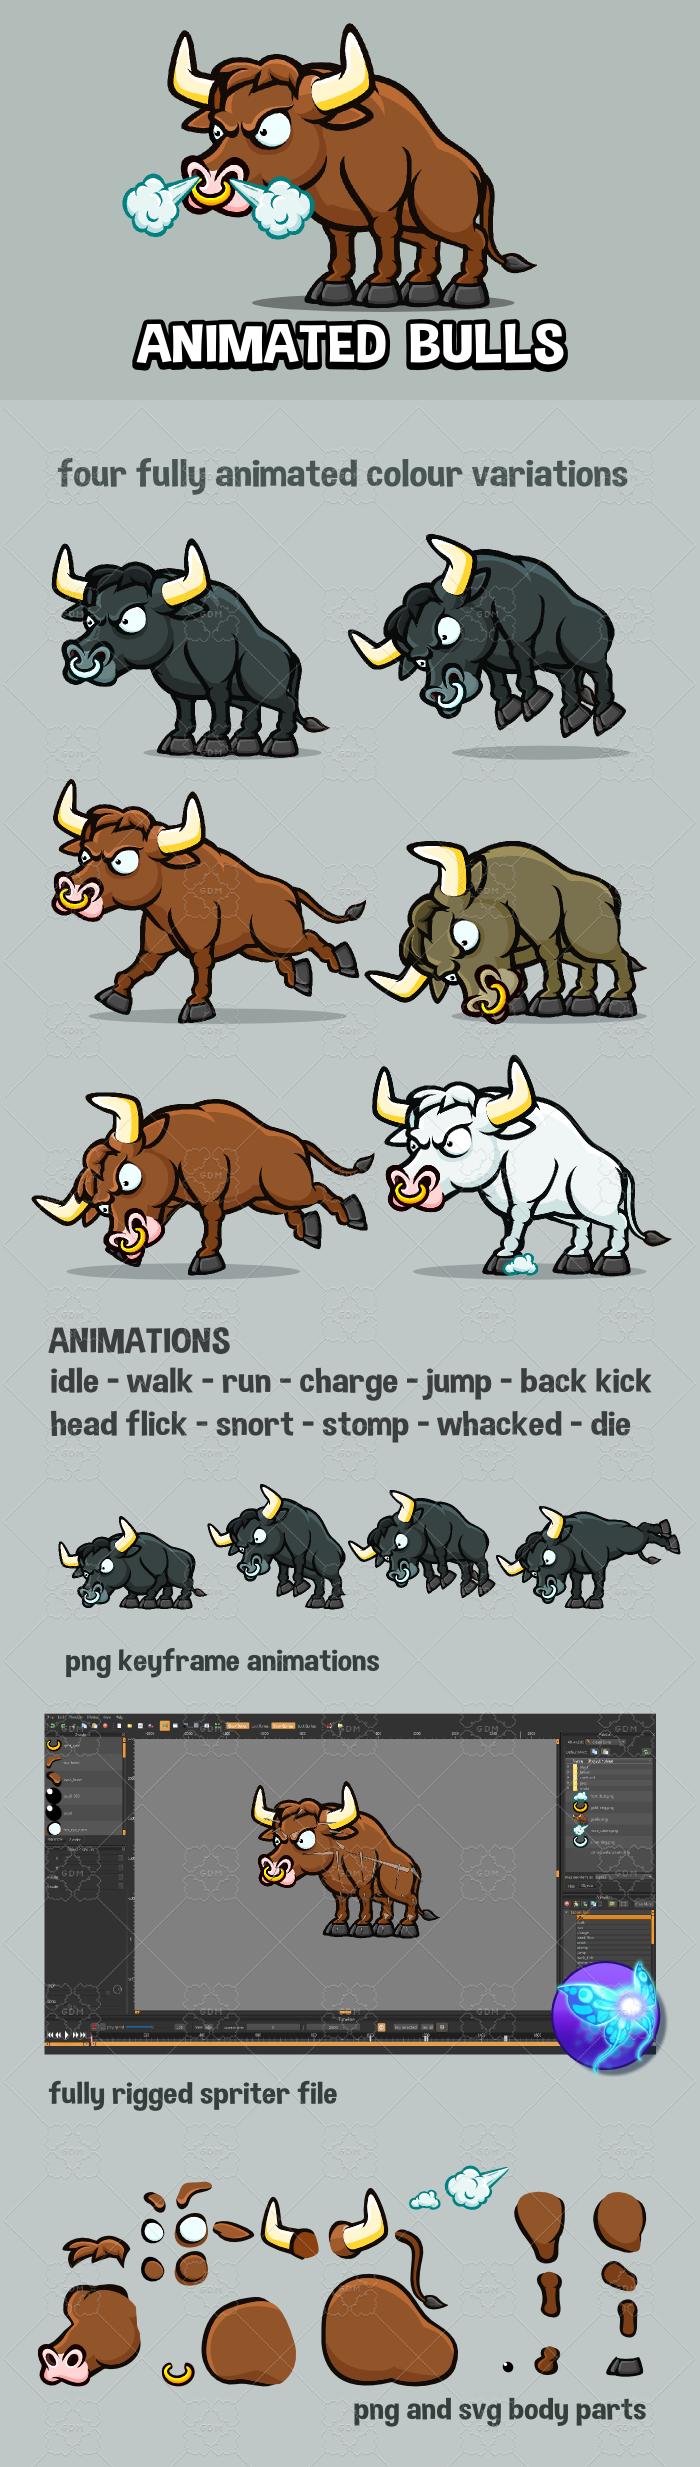 Animated bulls